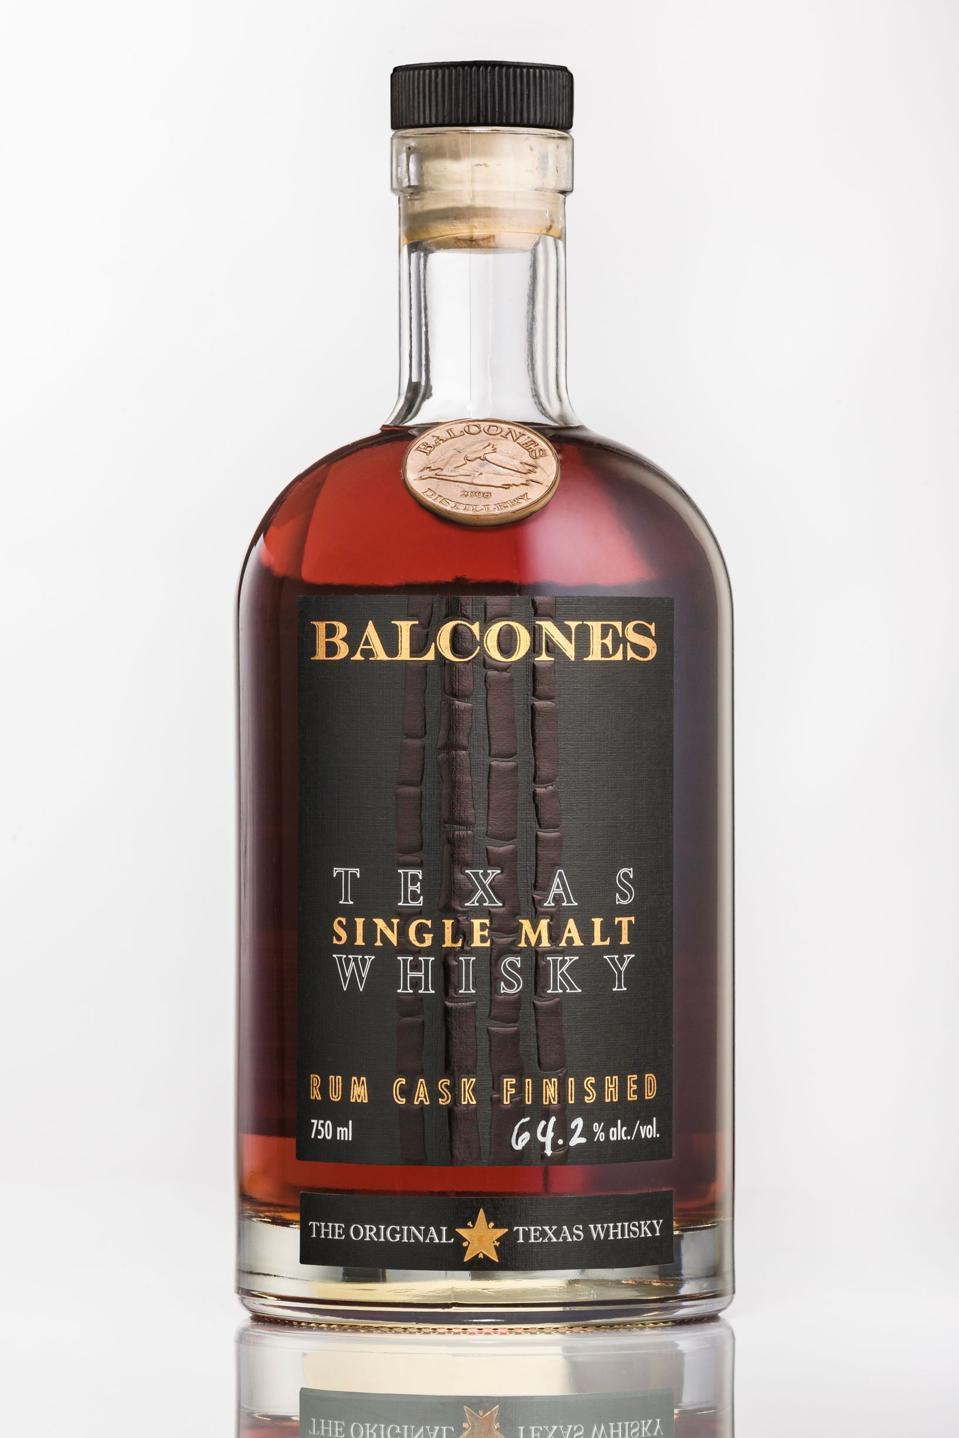 Balcones, Texas Single Malt Whisky, Rum Cask Finish